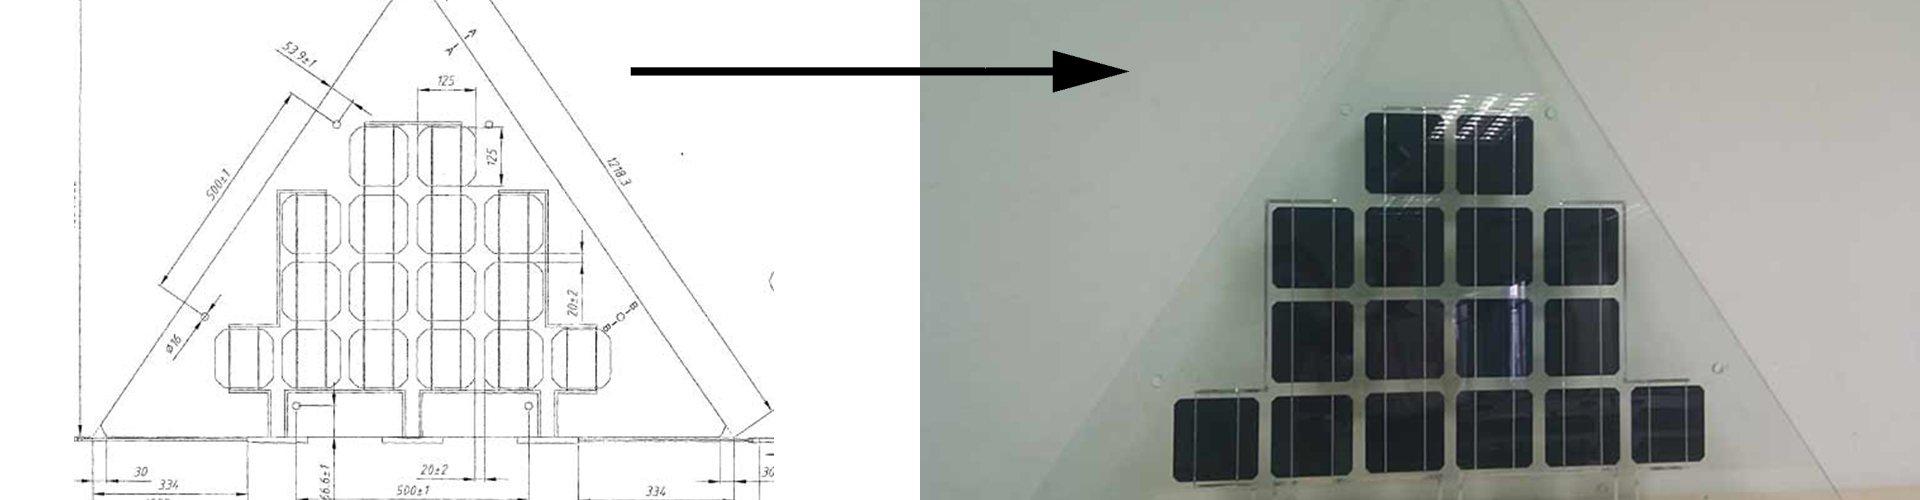 Custom Solar Module Engineering